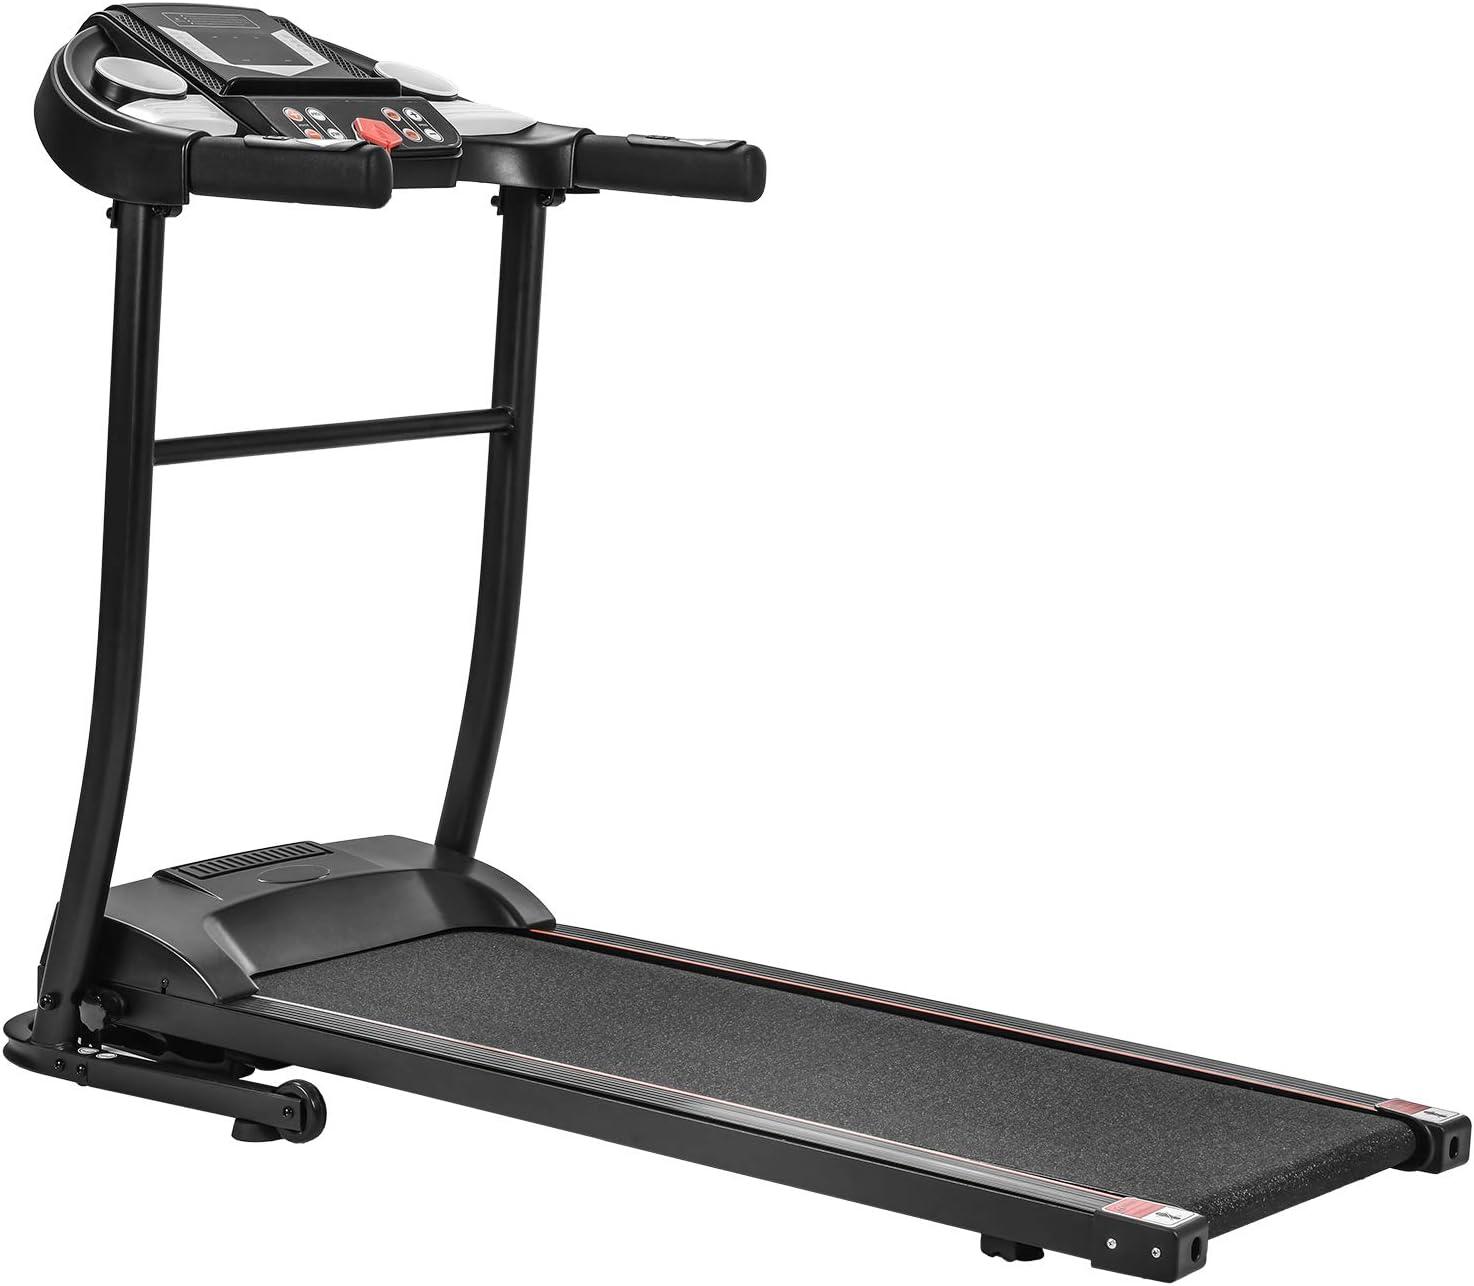 Merax Treadmill Folding Electric Ranking 35% OFF TOP11 Wal Running Motorized